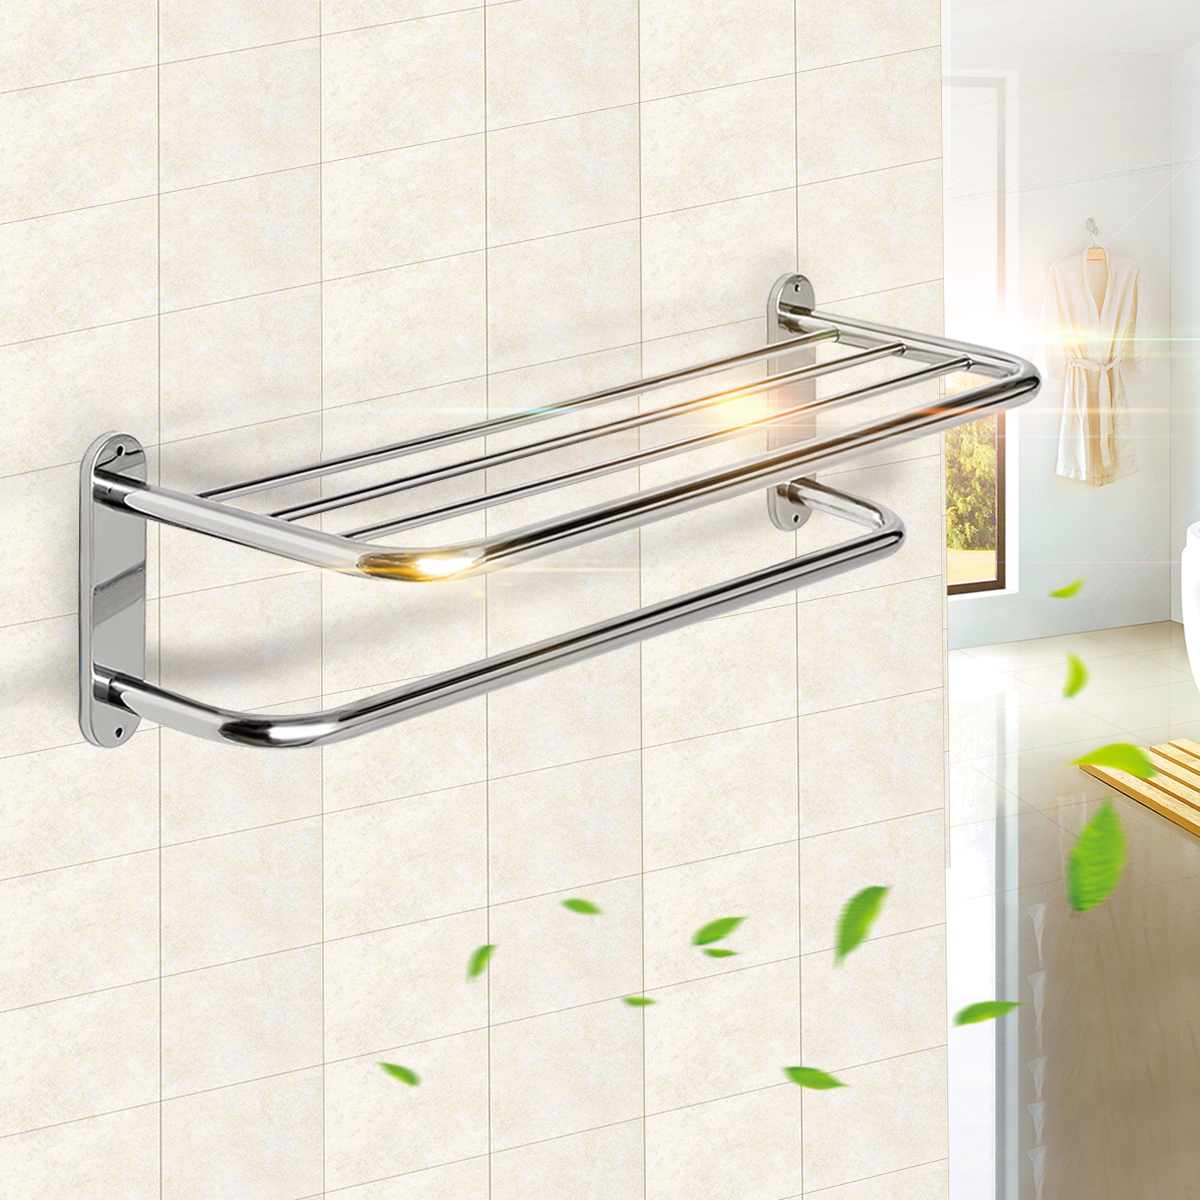 Xueqin 60cm Stainless Steel Chrome Polished Bathroom Wall Mounted Towel Rail Holder Shelf Storage Rack Double Towel Rails Bar